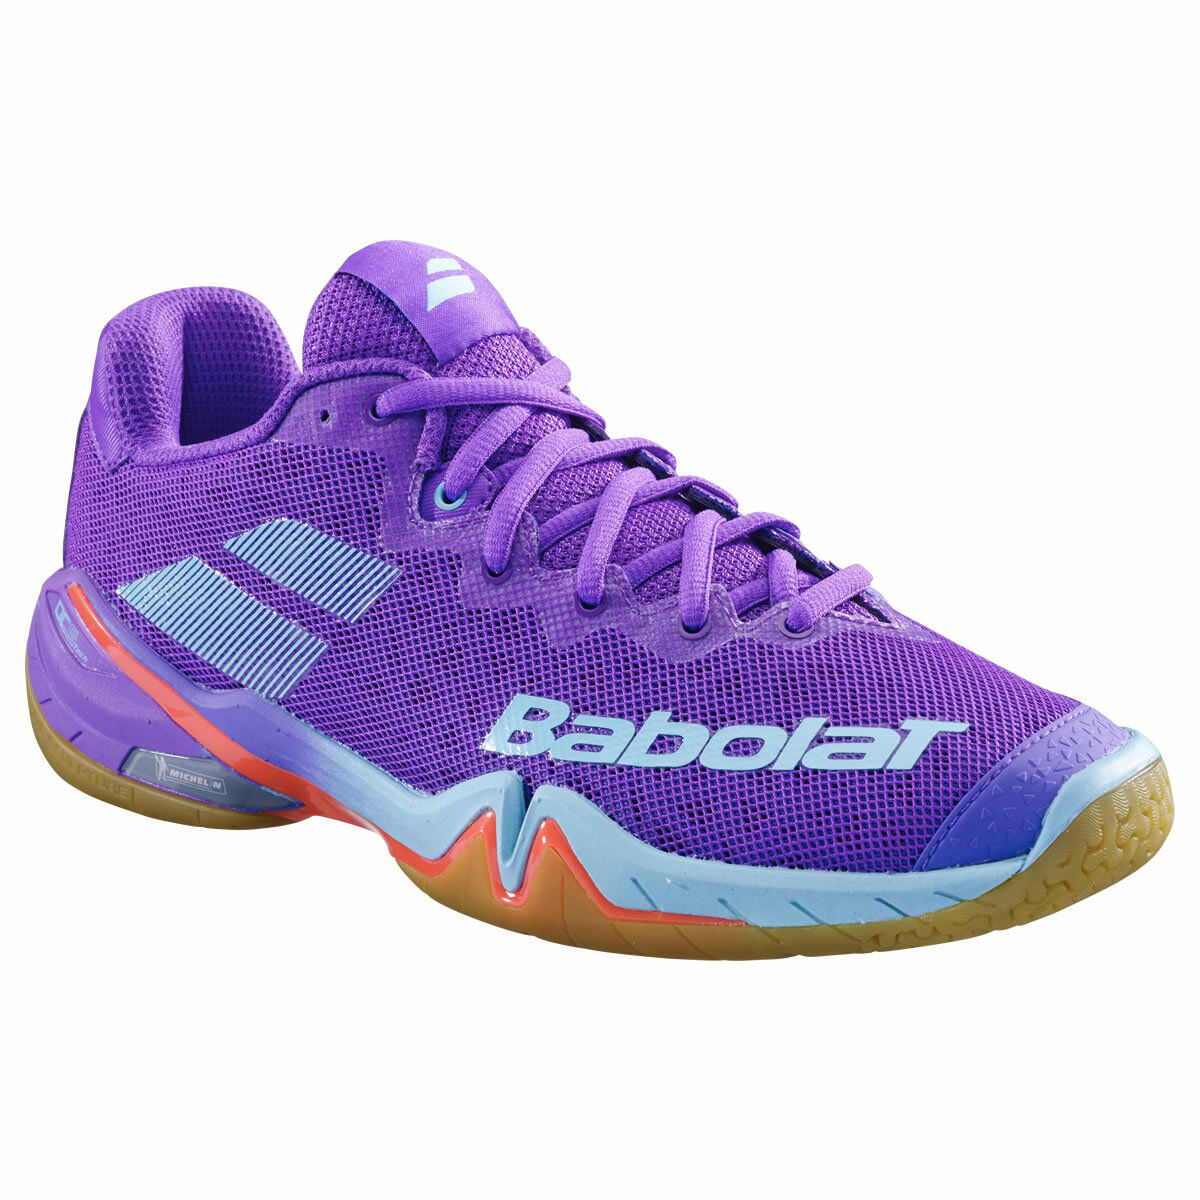 BABOLAT Shadow Tour Damen Sport Hallen Badminton Schuh Topmodell lila 2019 -NEU-